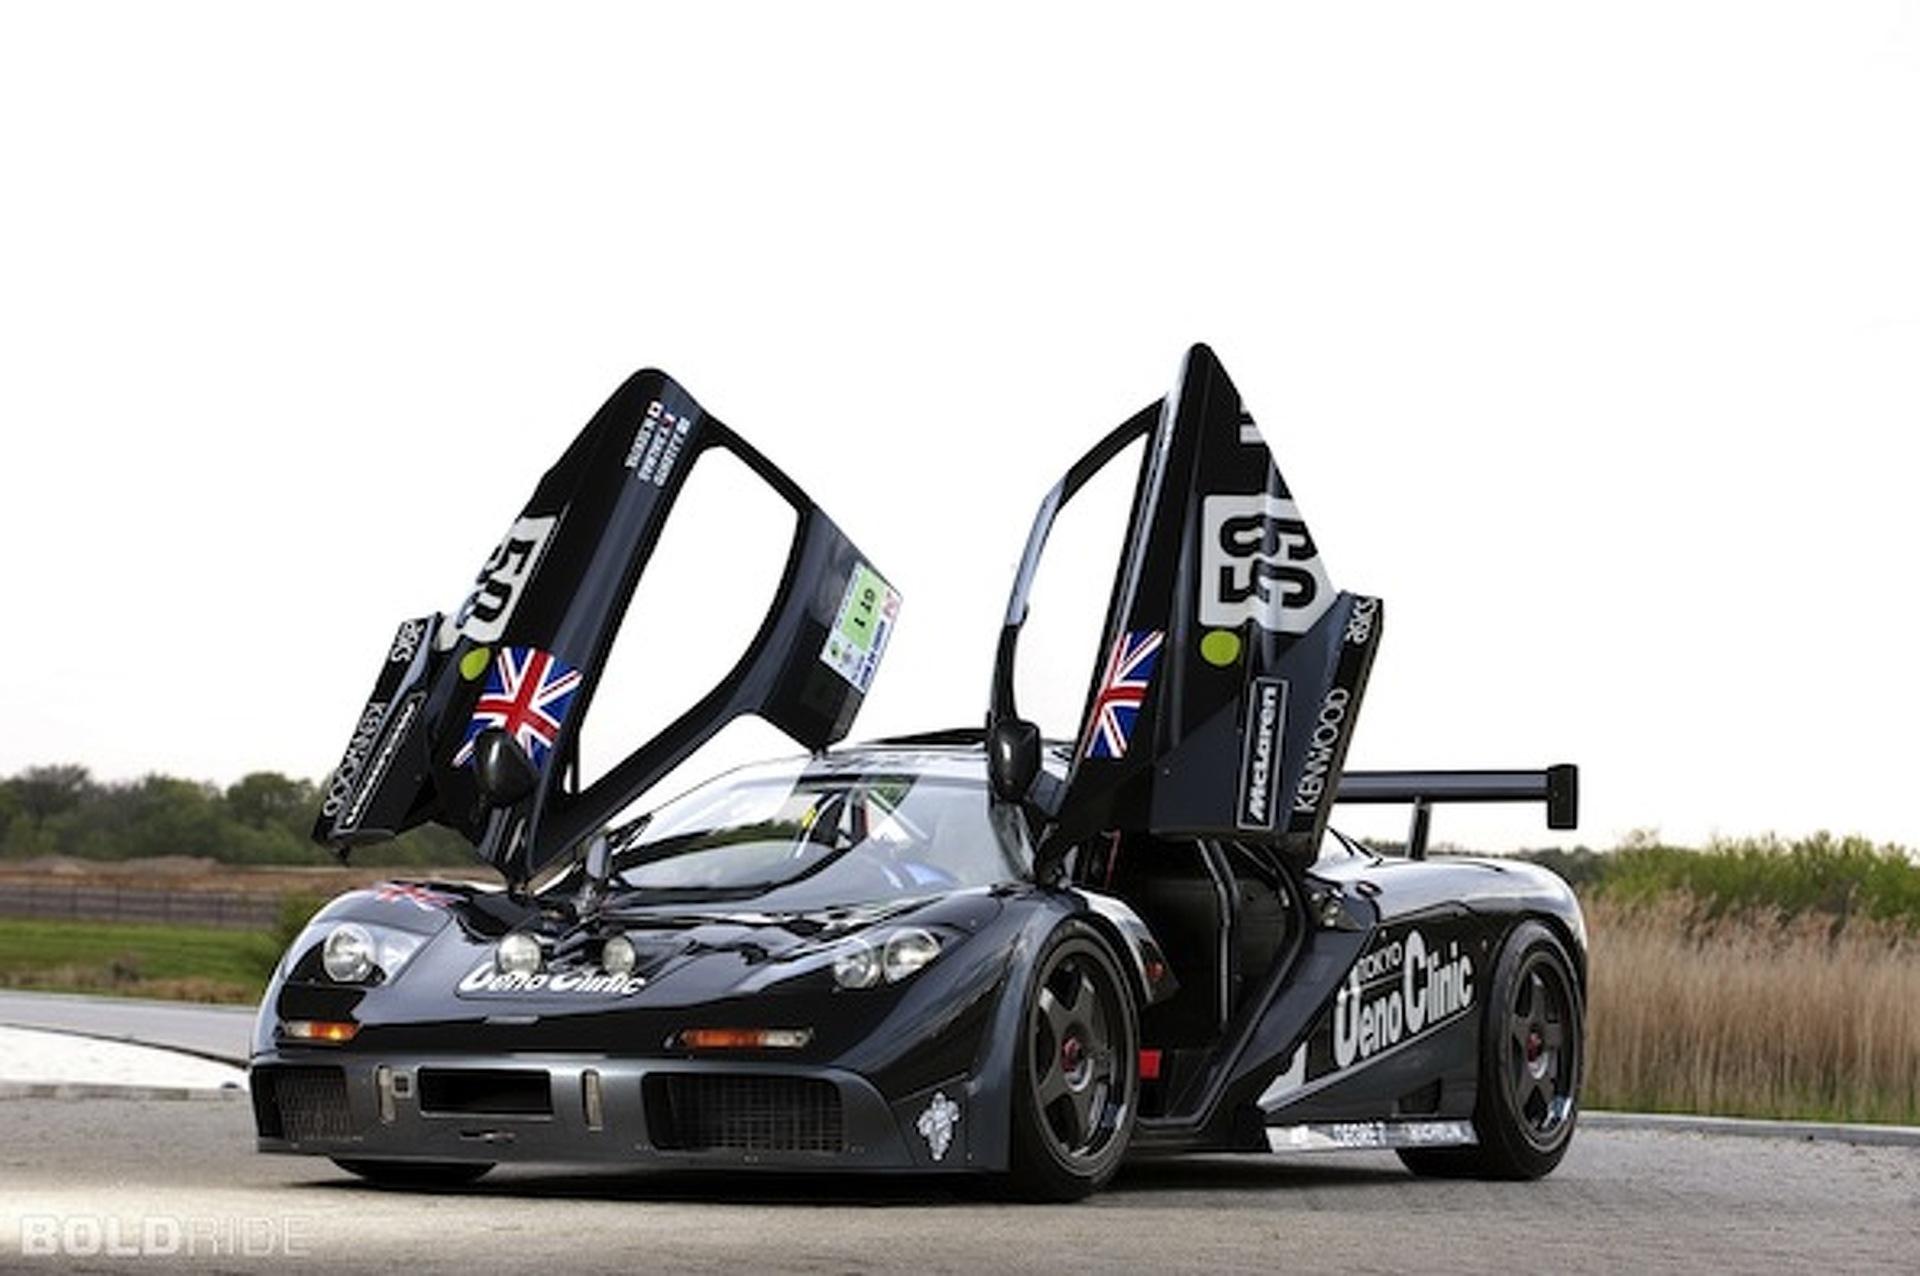 McLaren F1: A Legend of Motorization